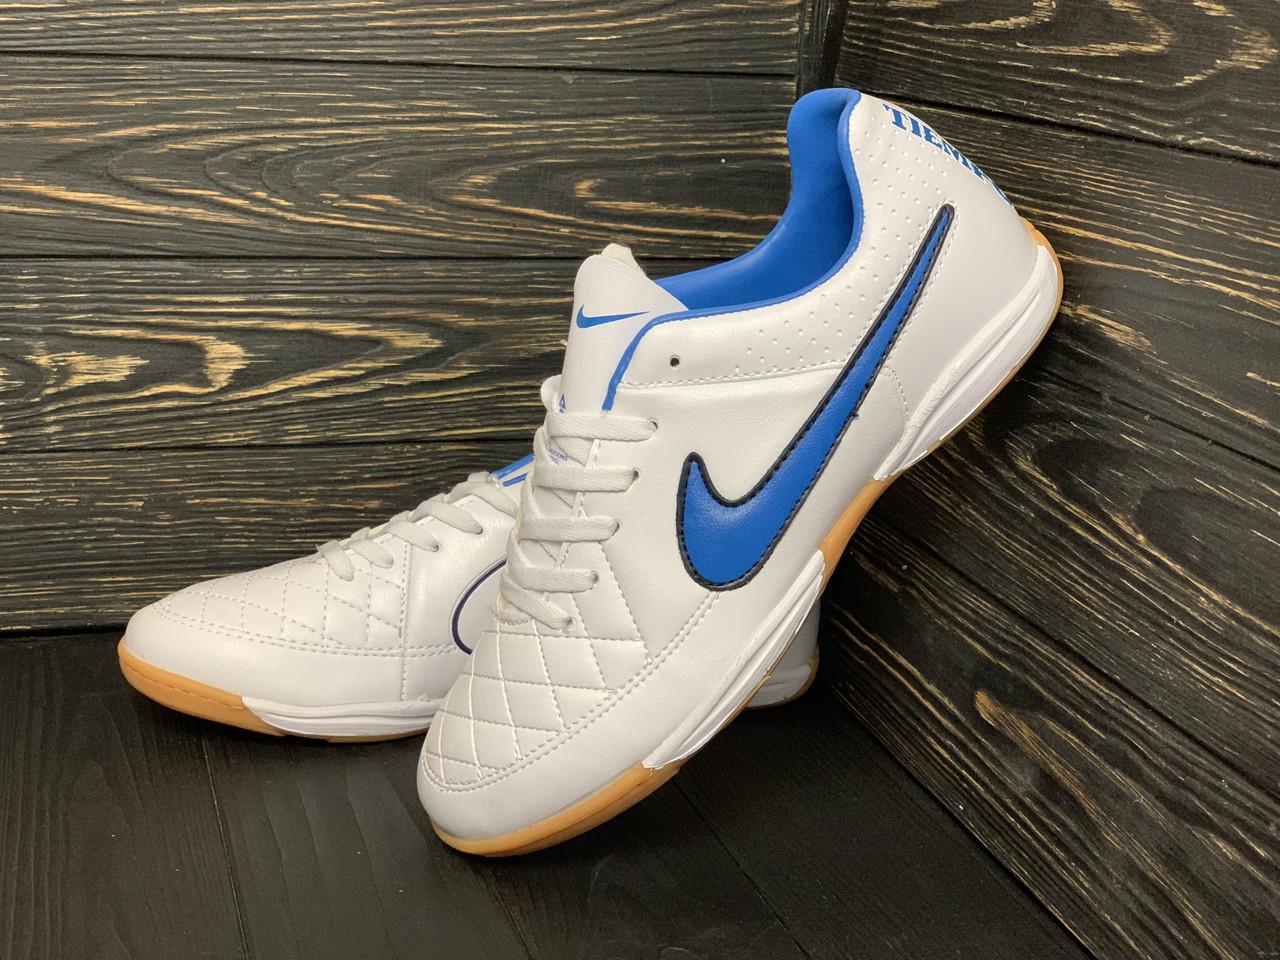 c8427078ce5829 Футзалки Nike Tiempo / бампы найк темпо: продажа, цена в Киеве ...